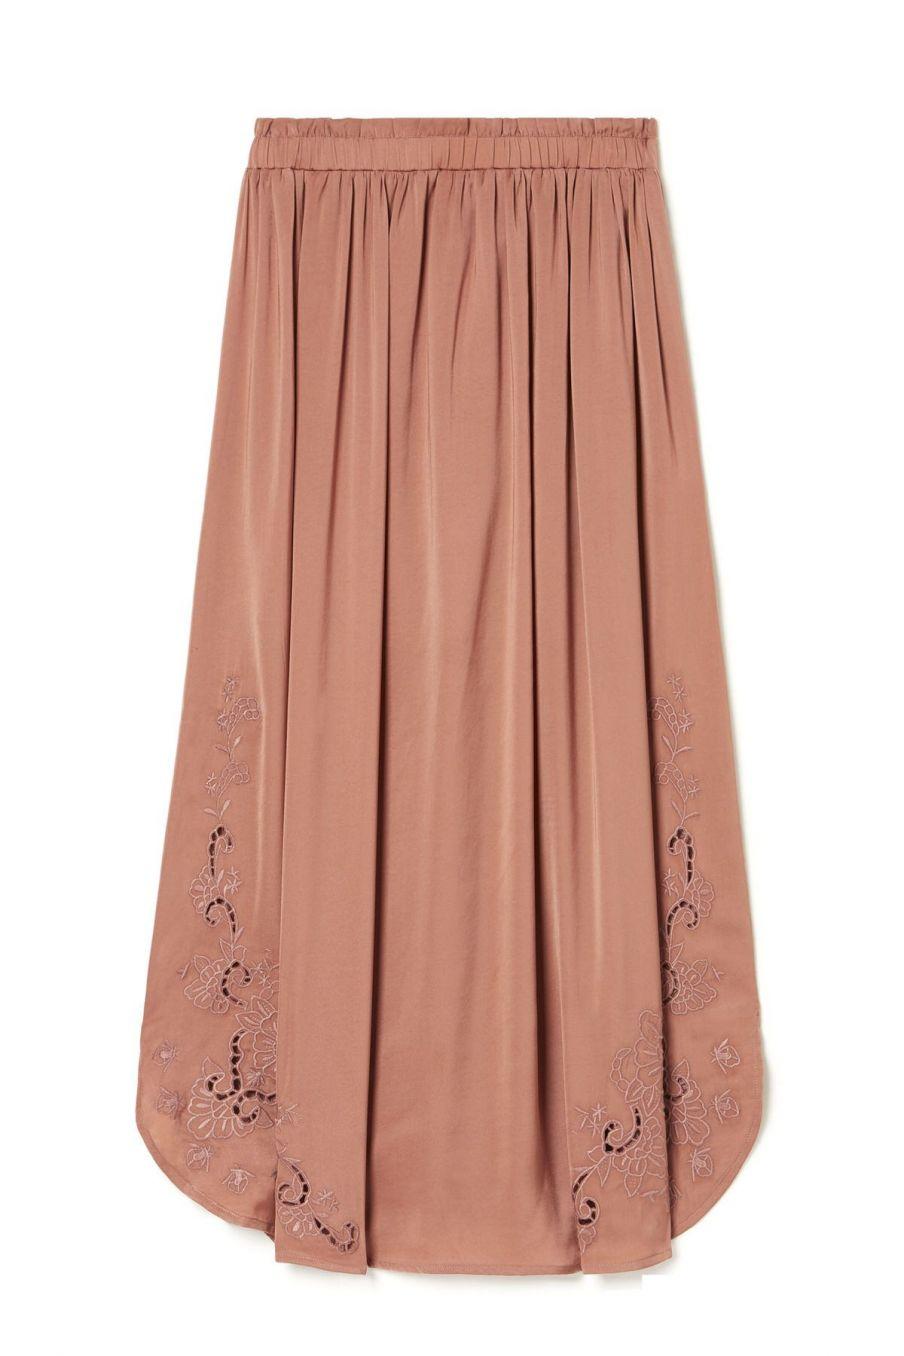 boheme chic vintage jupe femme maya sienna